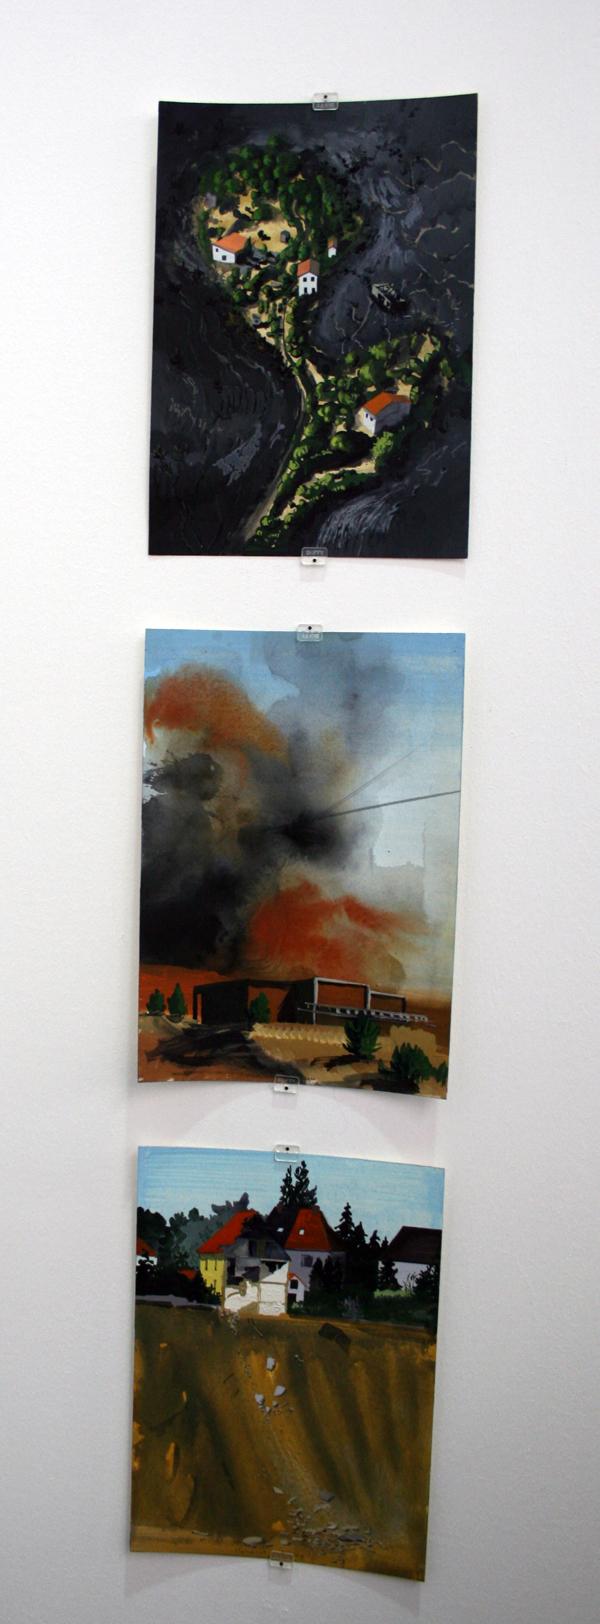 Witzenhausen Gallery - Olphaert den Otter